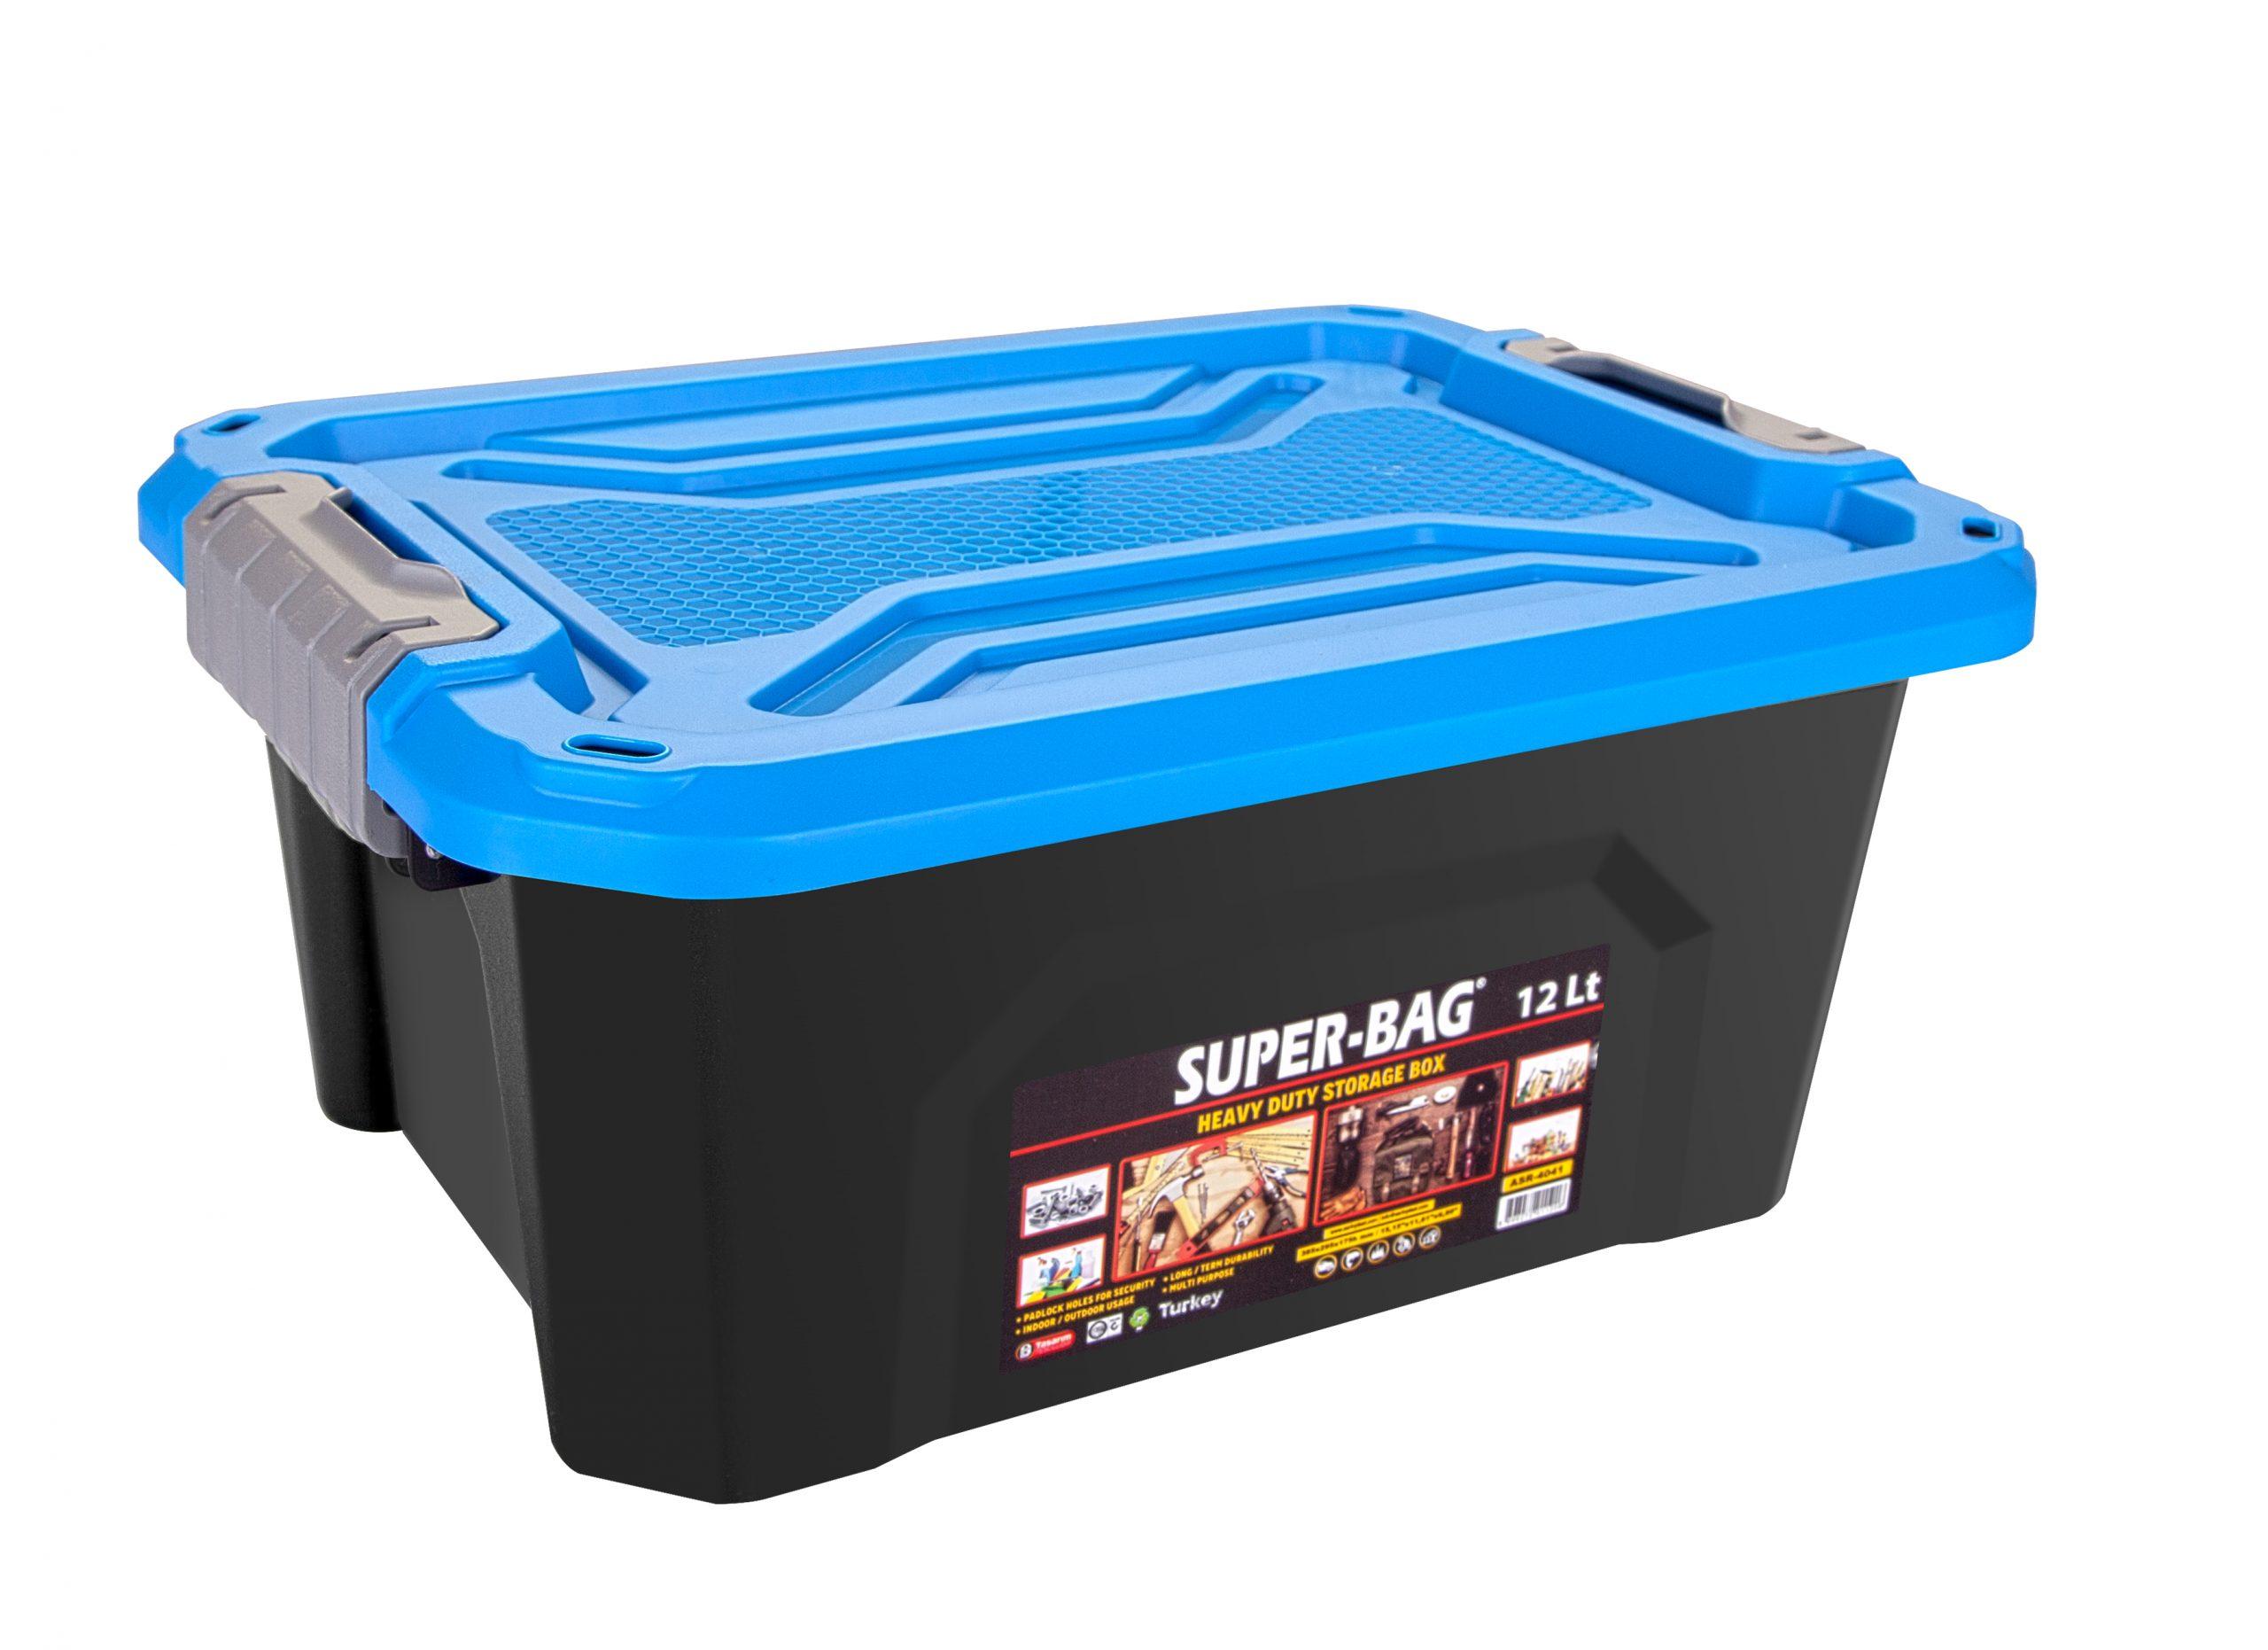 ASR-4041  Superbag Saklama Kutusu Renkli Kapak 12 LT